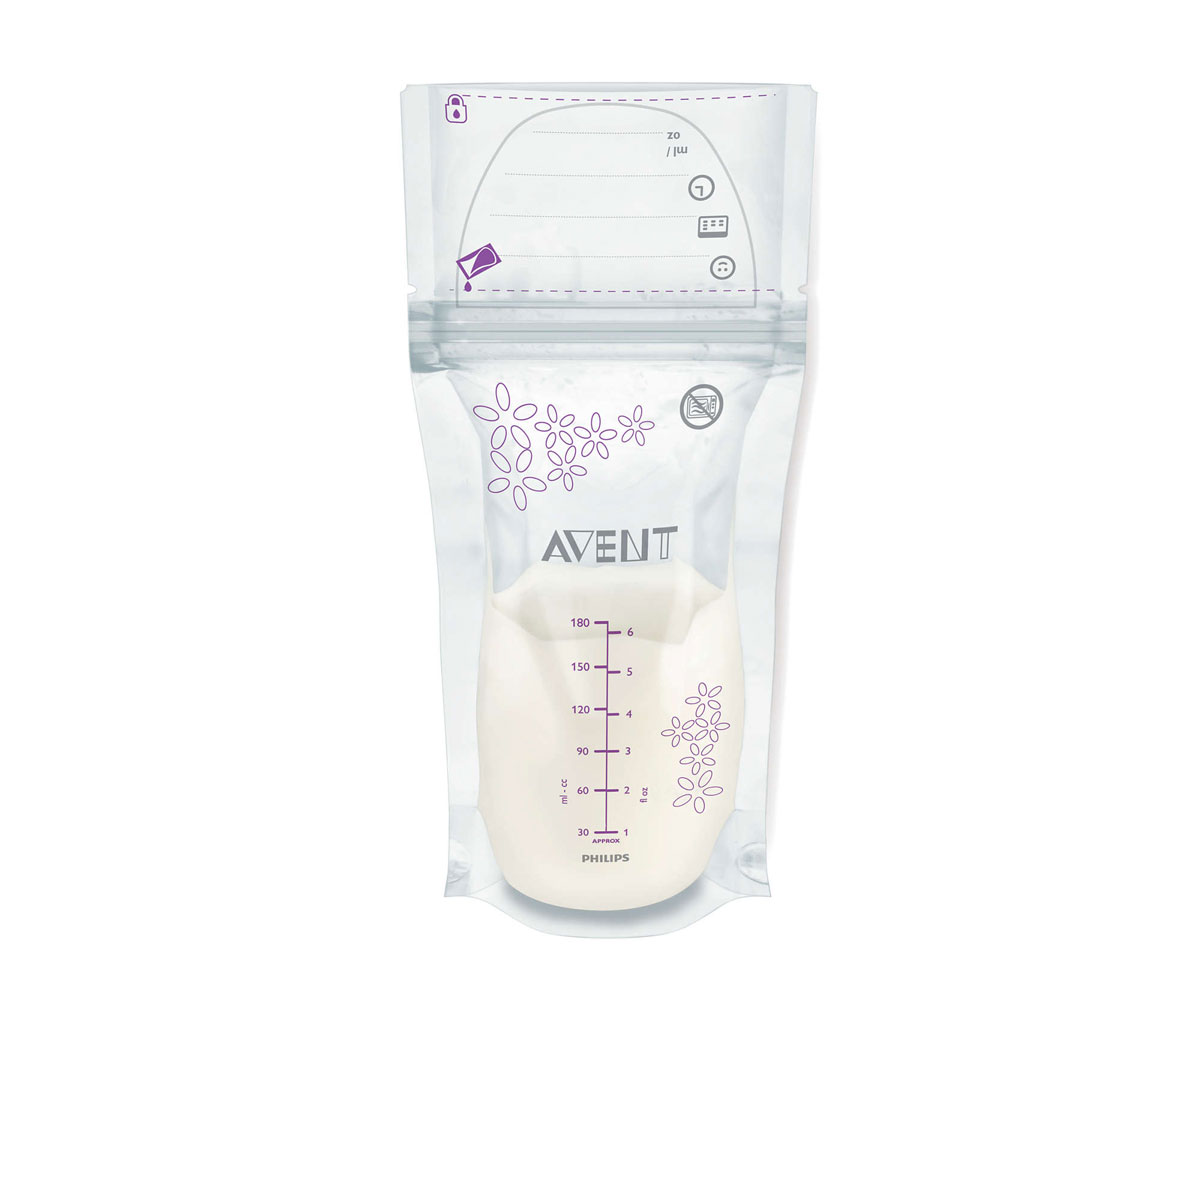 Philips Avent Пакеты для хранения молока, 180 мл, 25 шт SCF603/25 ручной молокоотсос philips avent серии natural scf330 13 с контейнерами для хранения молока philips avent